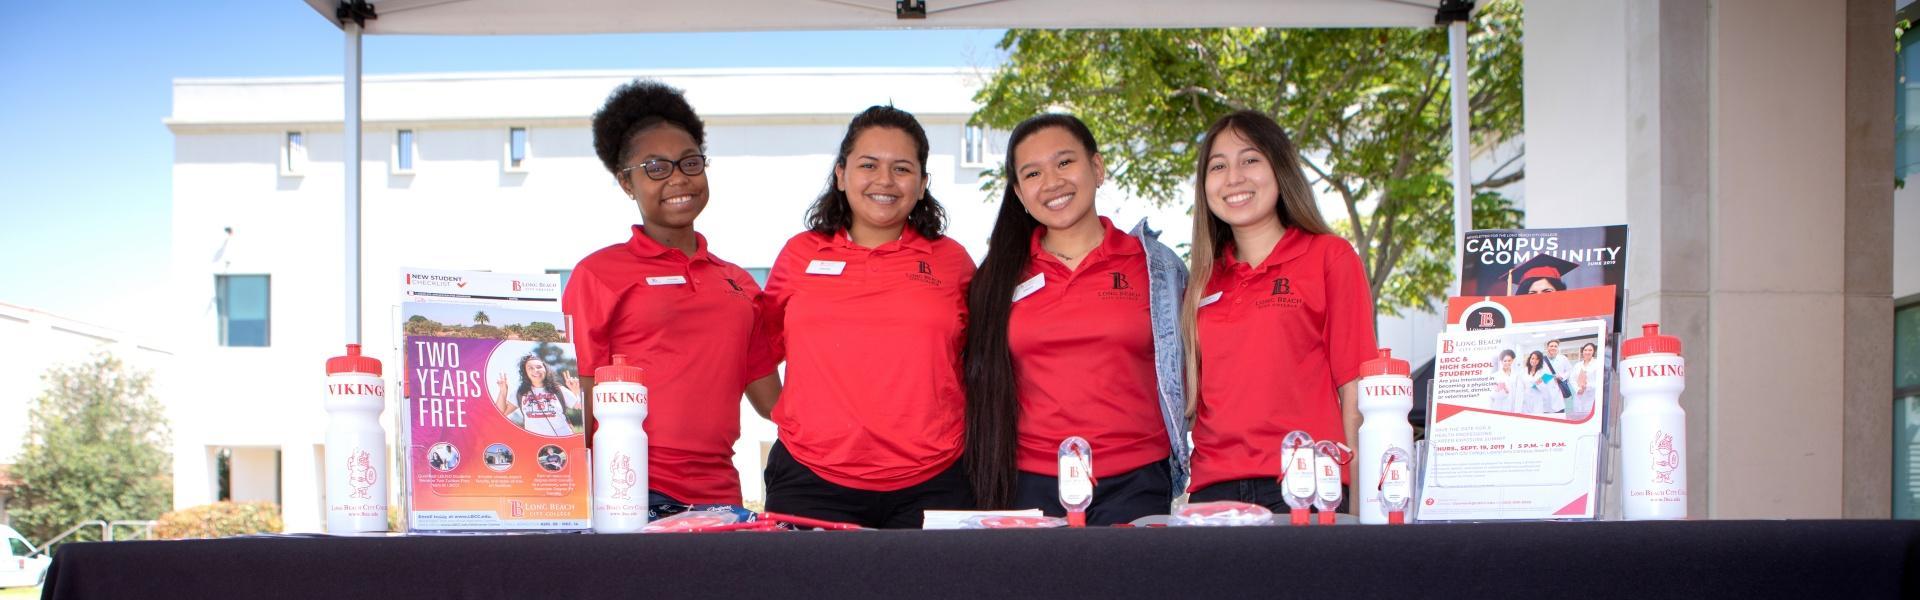 Long Beach City College - LBCC